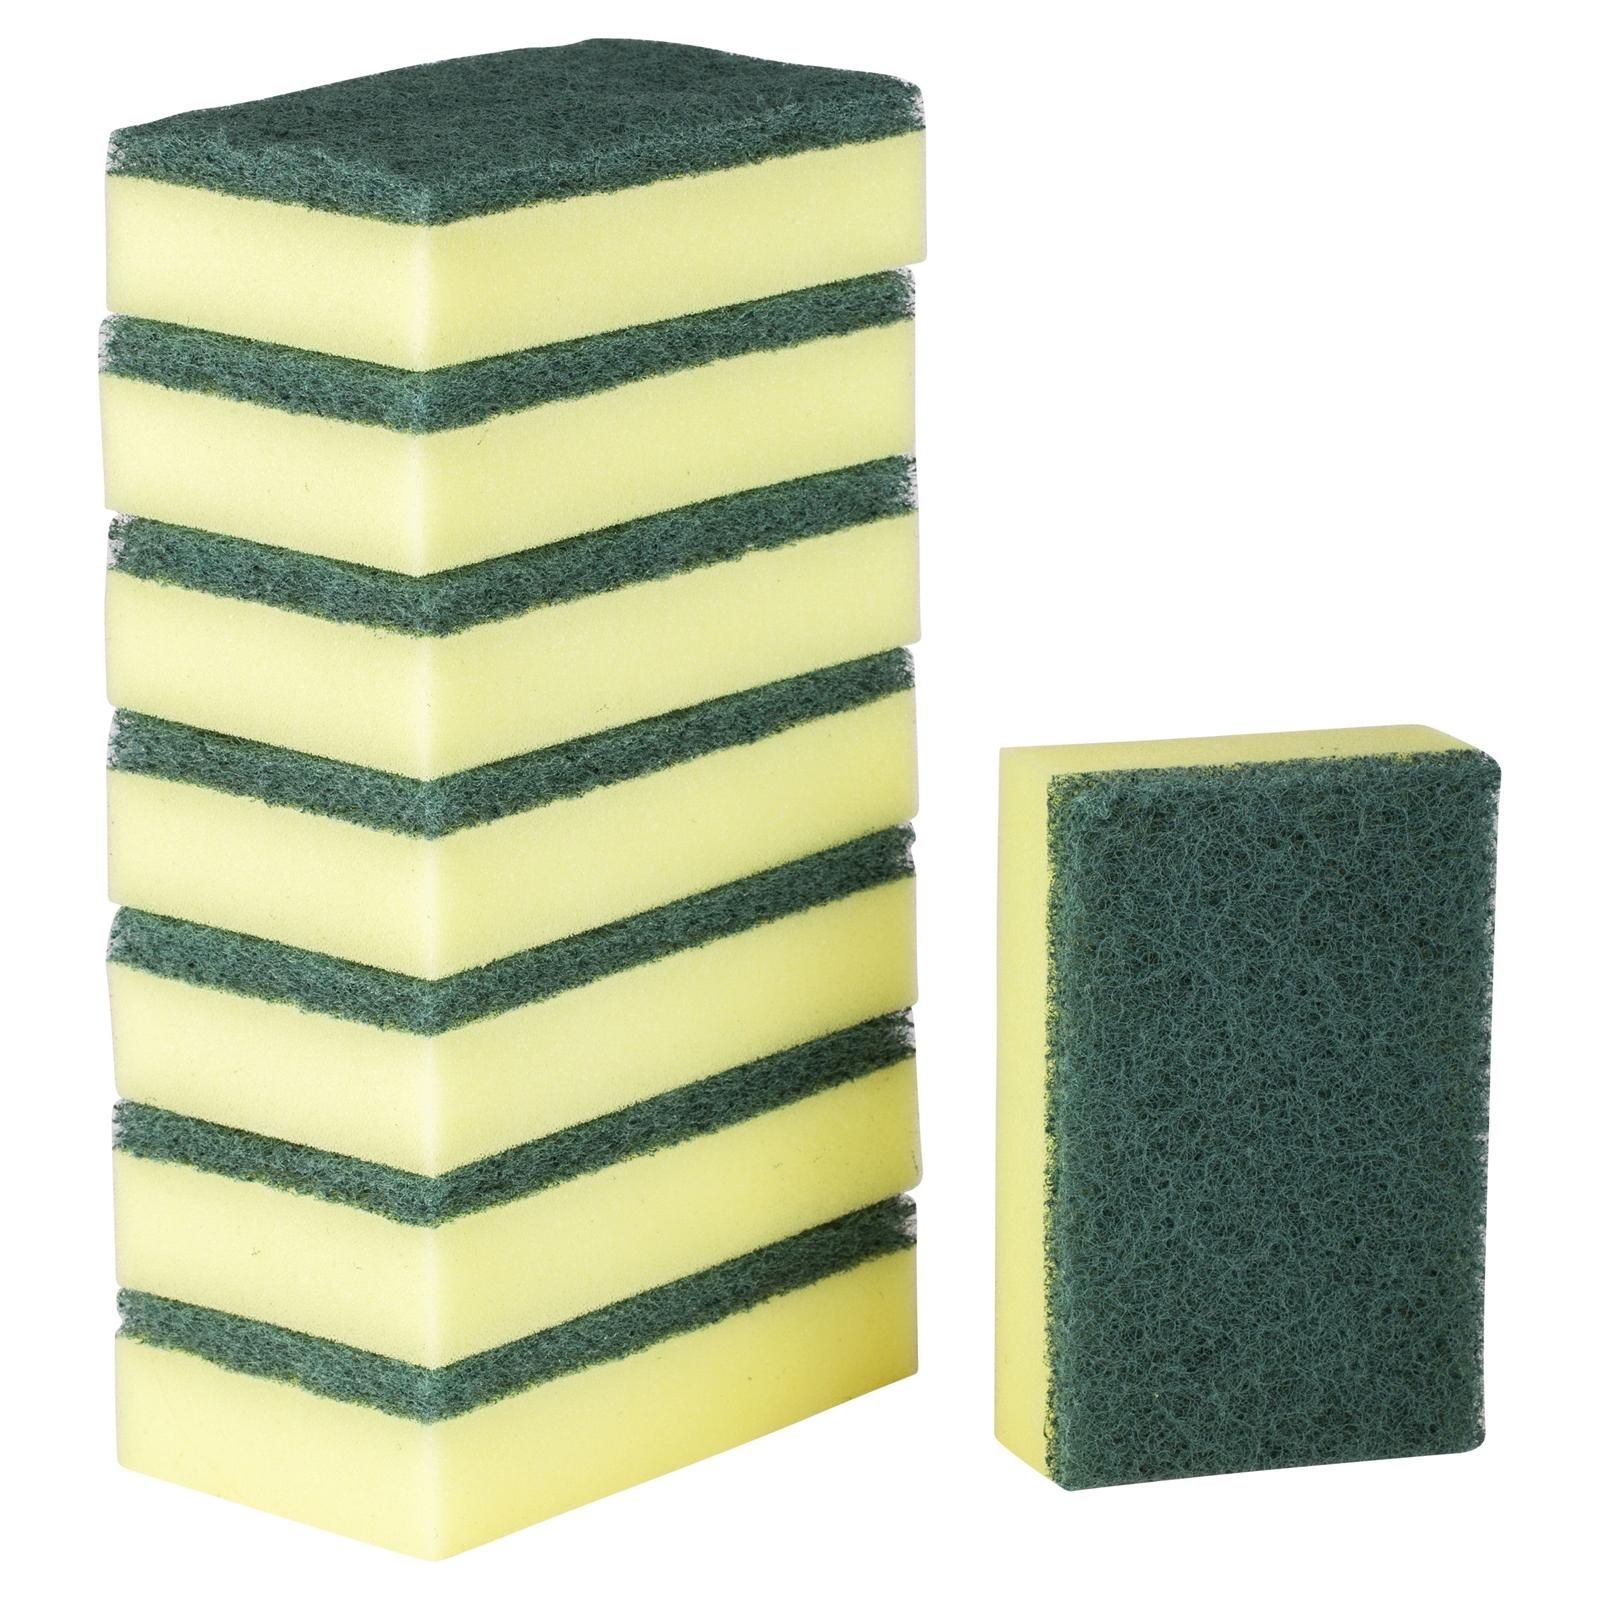 3M Scotch-Brite 120mm x 80mm Heavy Duty Scrub Sponges - 8 Pack